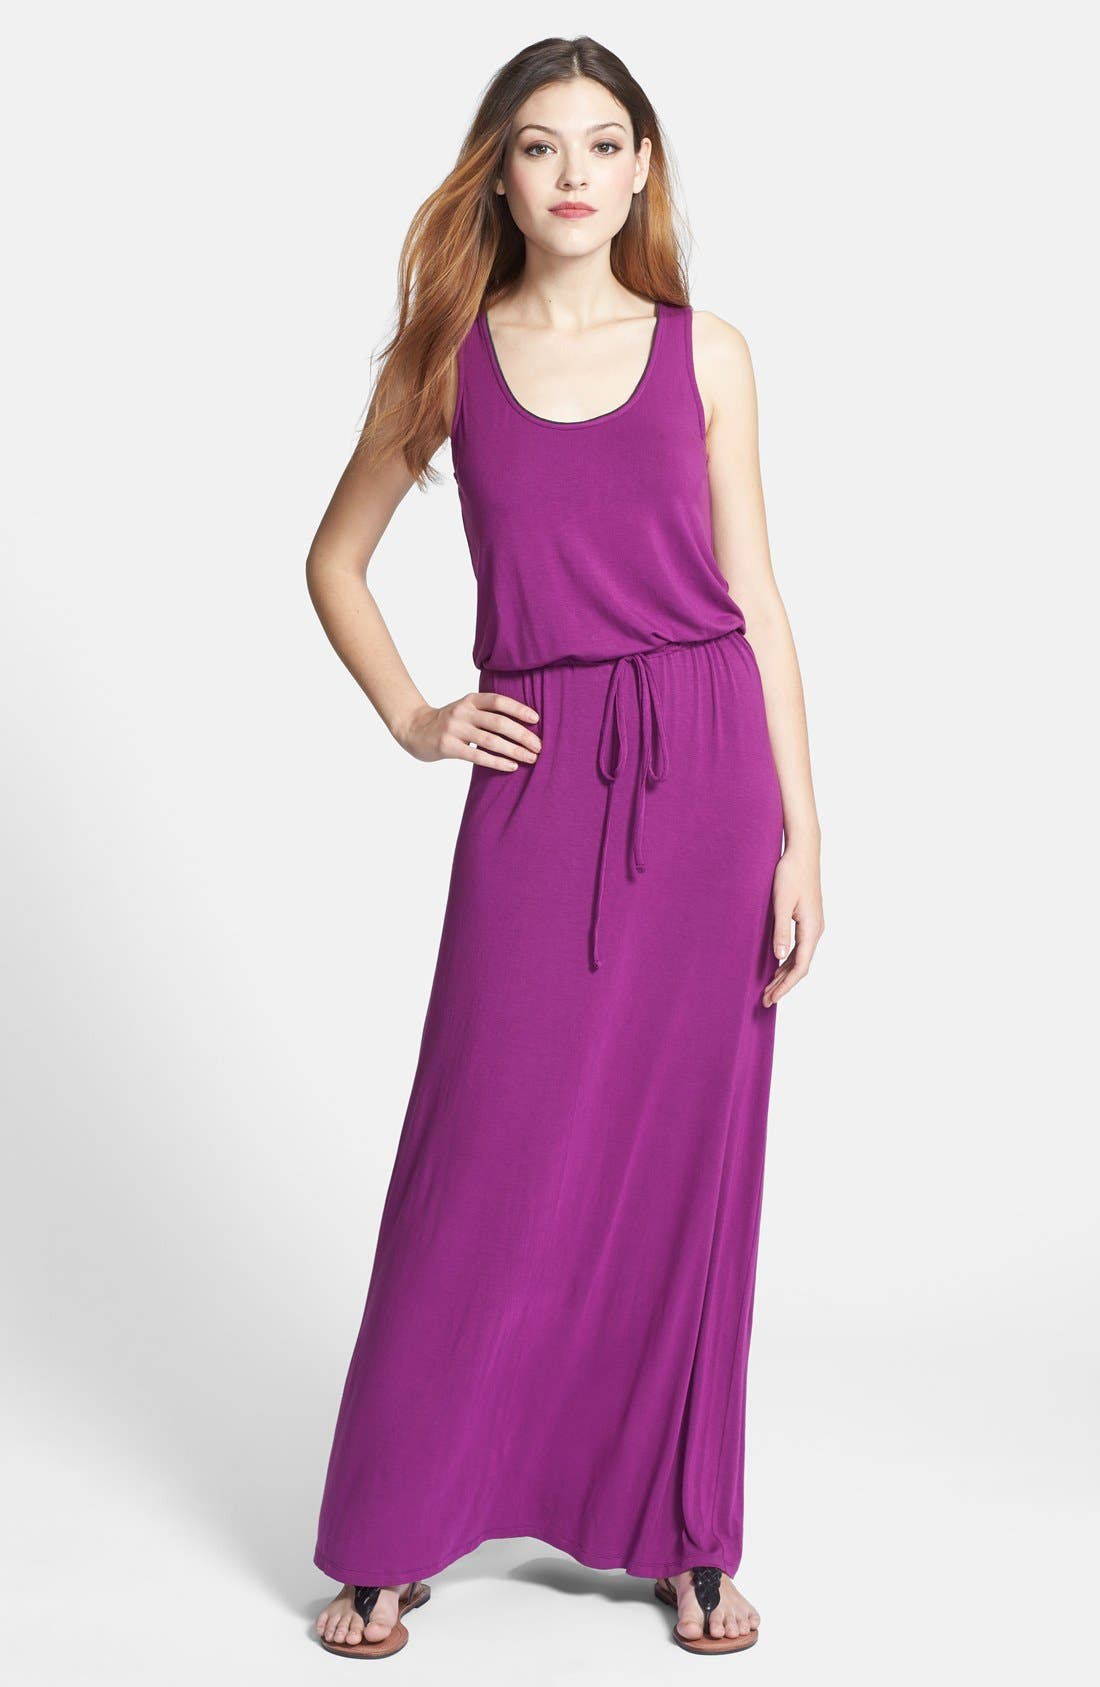 Contrast Stripe Racerback Maxi Dress,                         Main,                         color, Purple Phlox/ Heather Charcoal